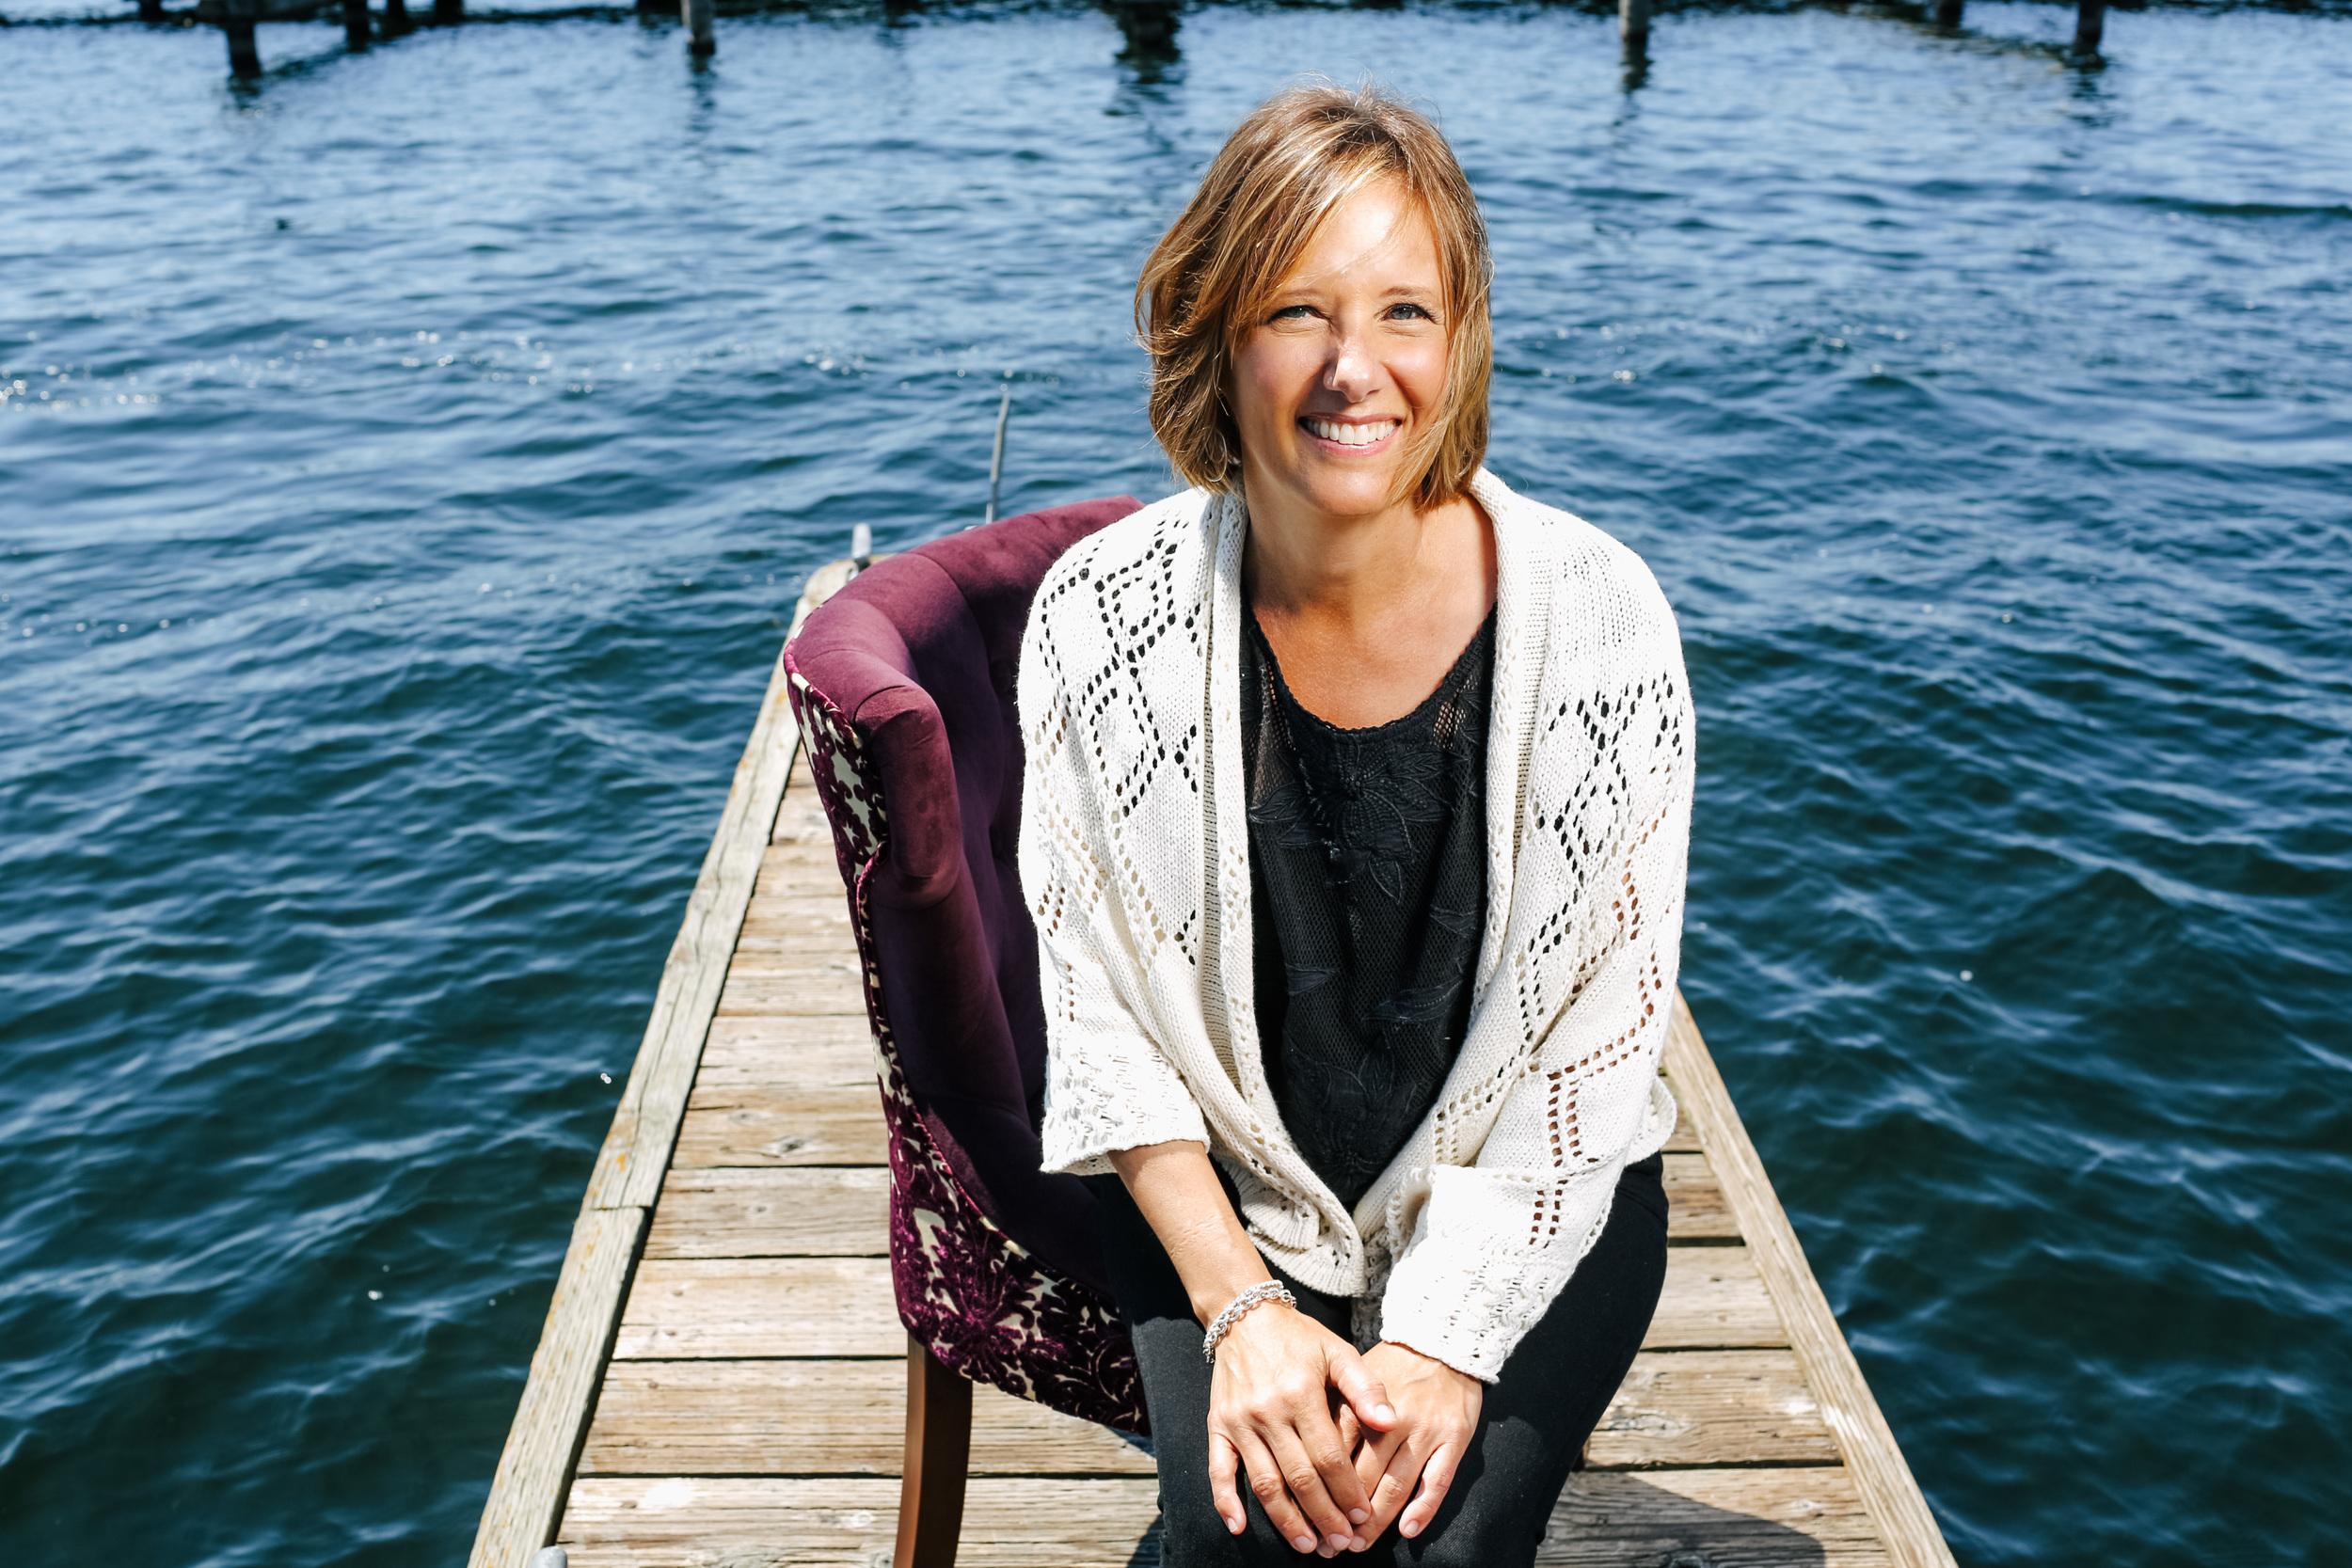 Michelle Matson | Seattle Domestic Violence Counselor